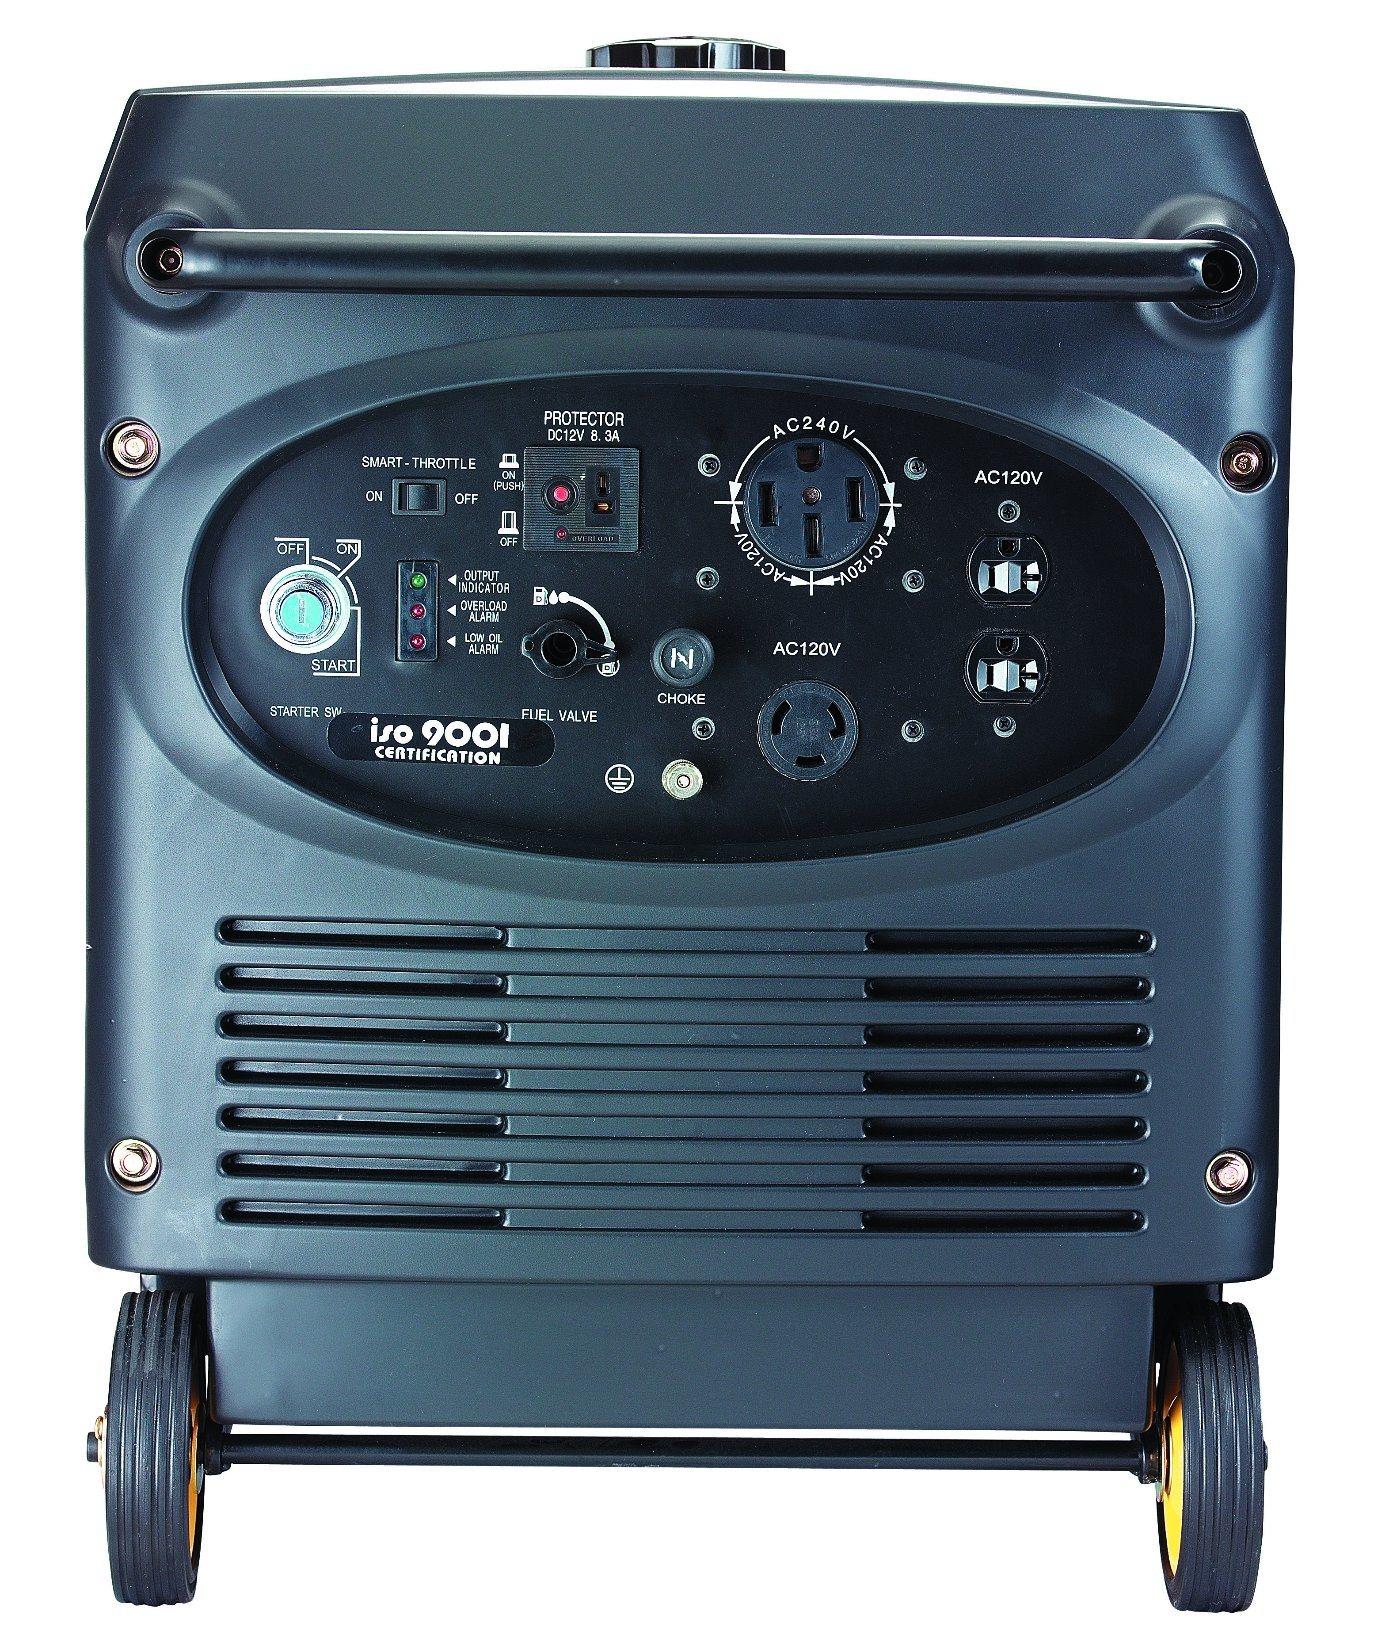 China Kipor Ig6000 Ig6000p Gasoline Generator 6kw for Home Use